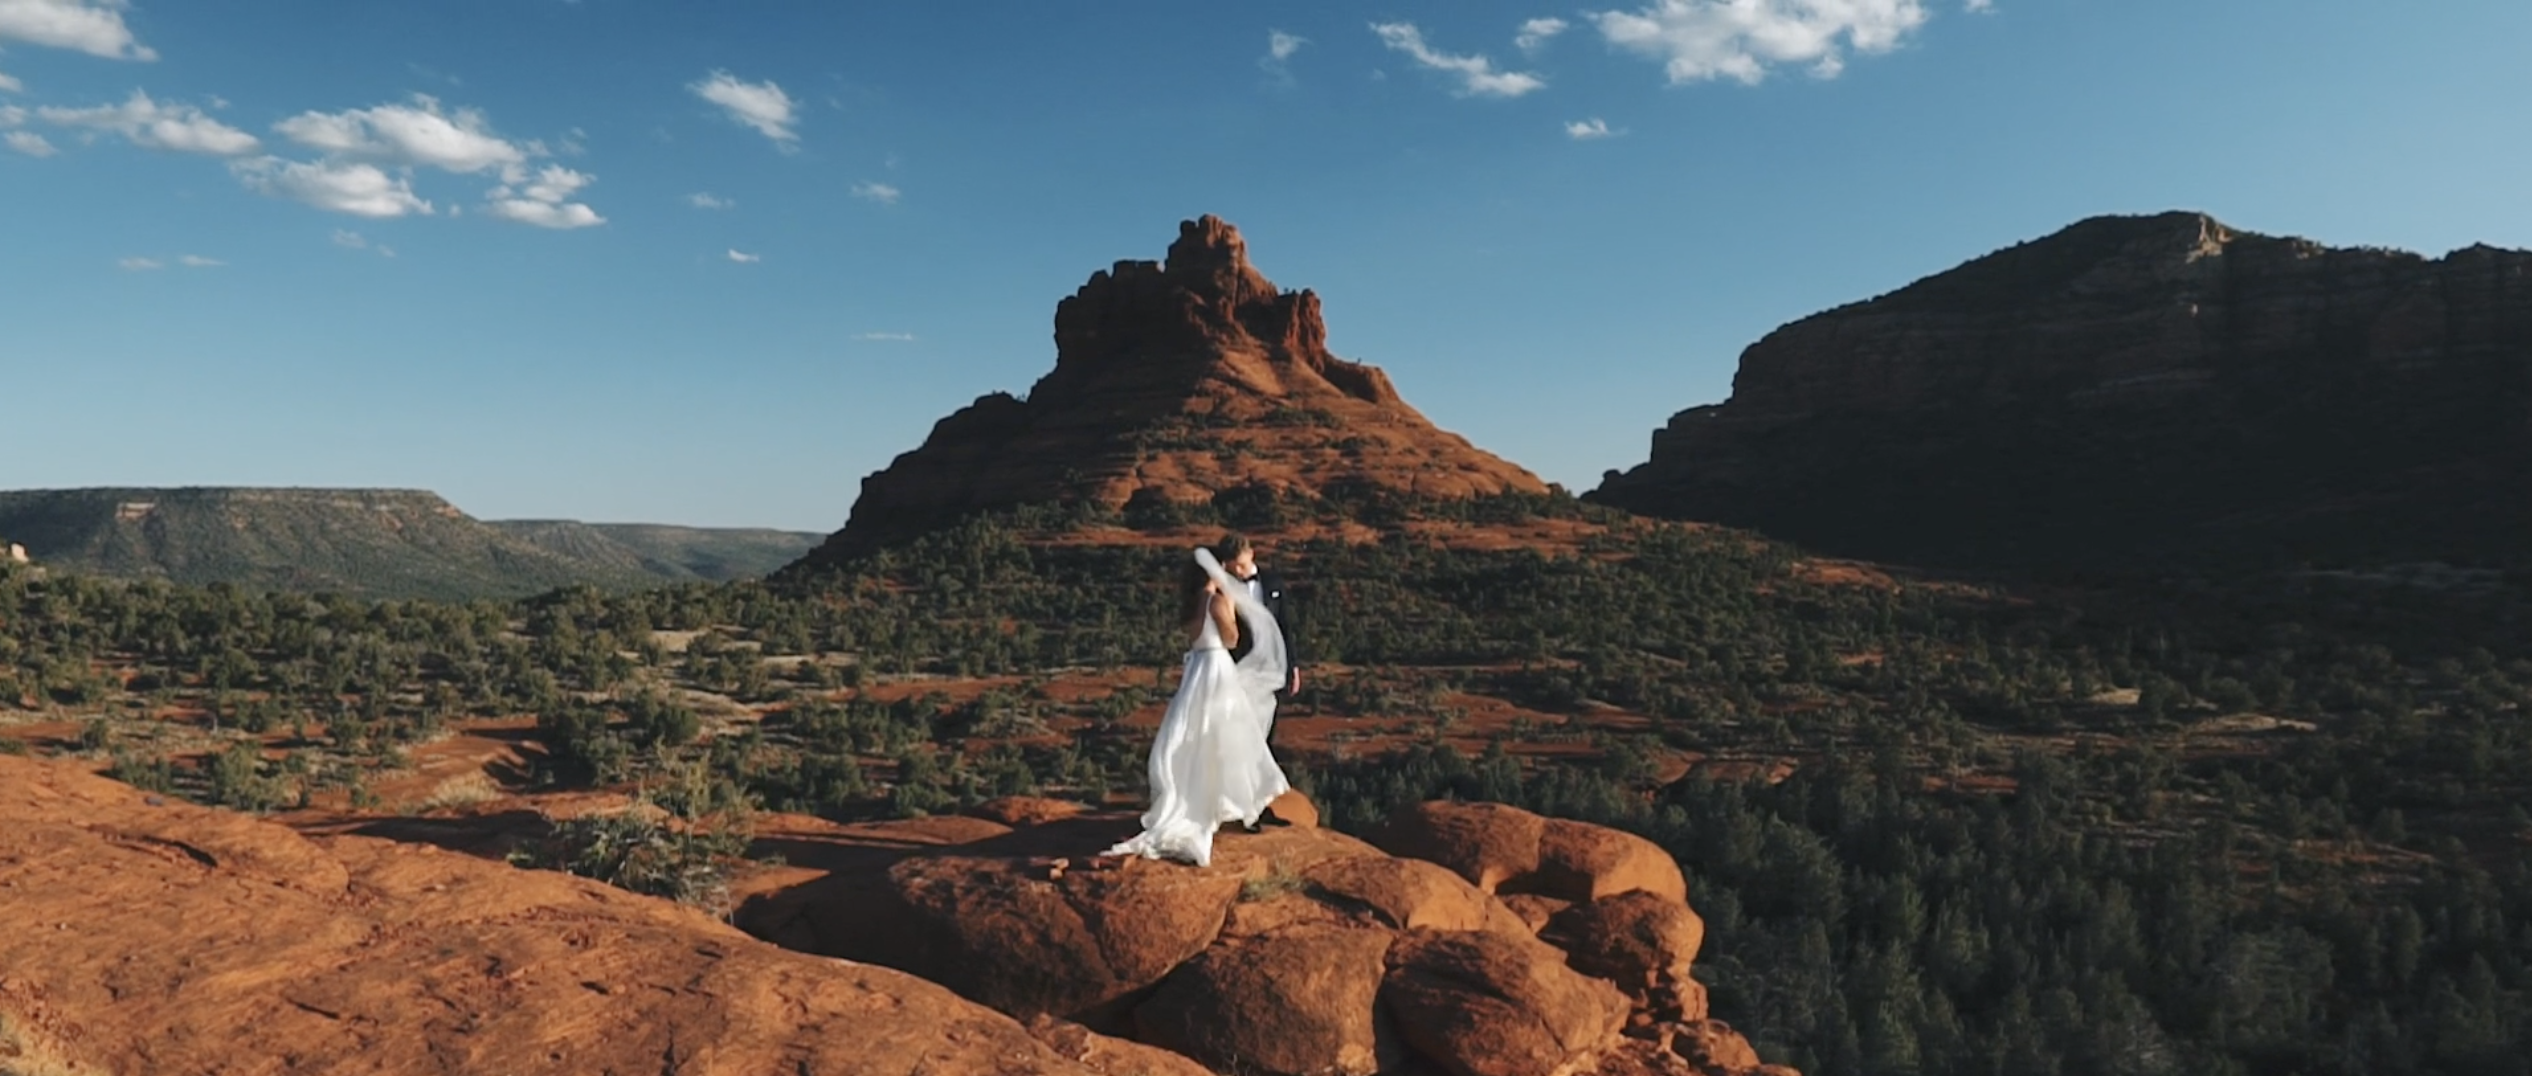 Victoria + Cameron | Sedona, Arizona | L'Auberge de Sedona